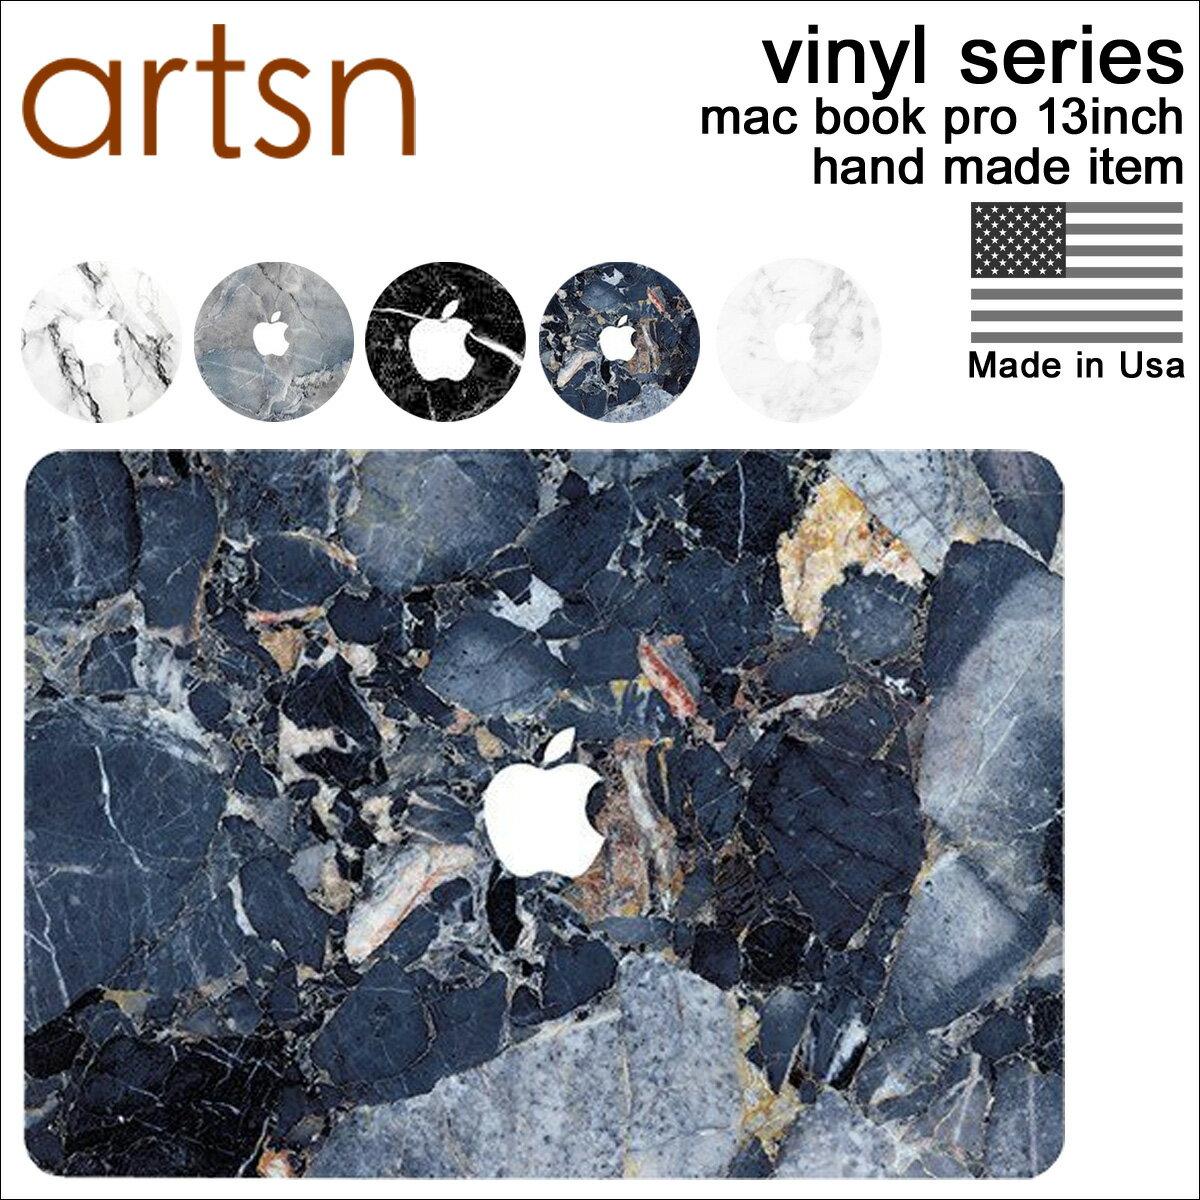 ARTSN アーツン MacBook Pro 13 シール ケース マックブックプロ カバー 保護フィルム マーブル VINYL SERIES [12/28 追加入荷]